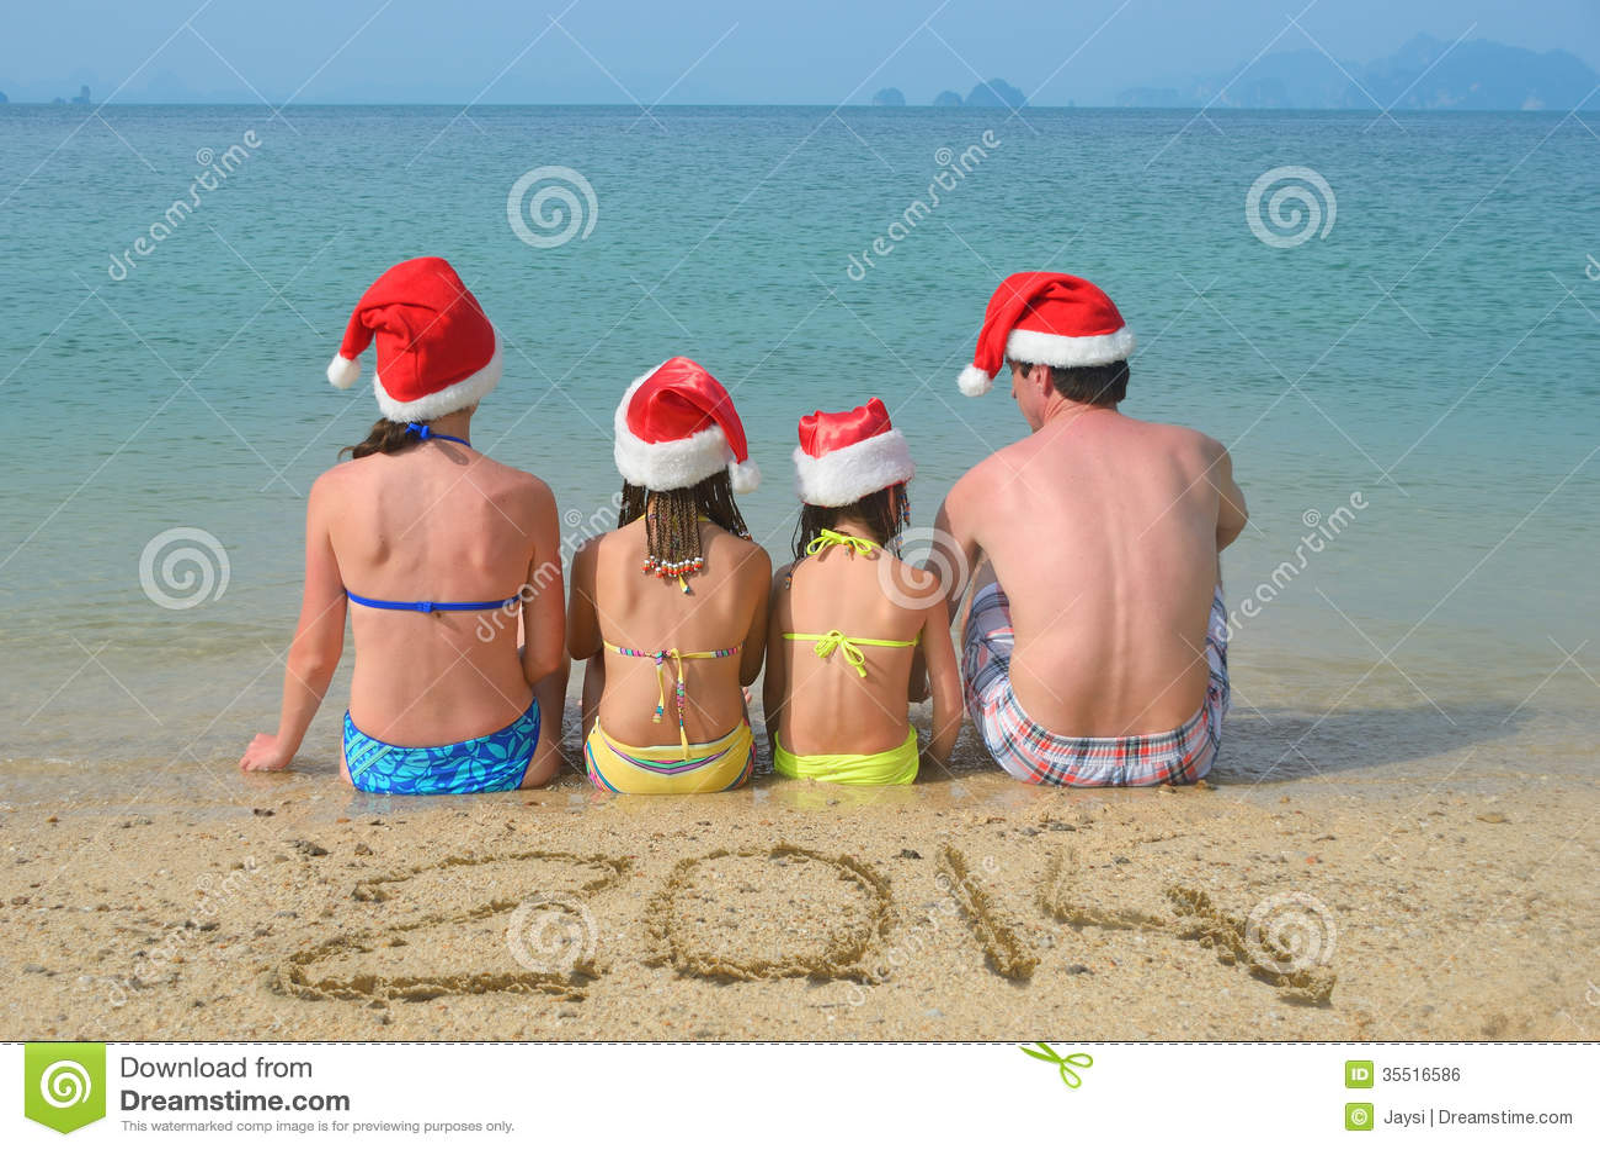 funny christmas card photo ideas for kids - Family In Santa Hats Having Fun Beach Stock